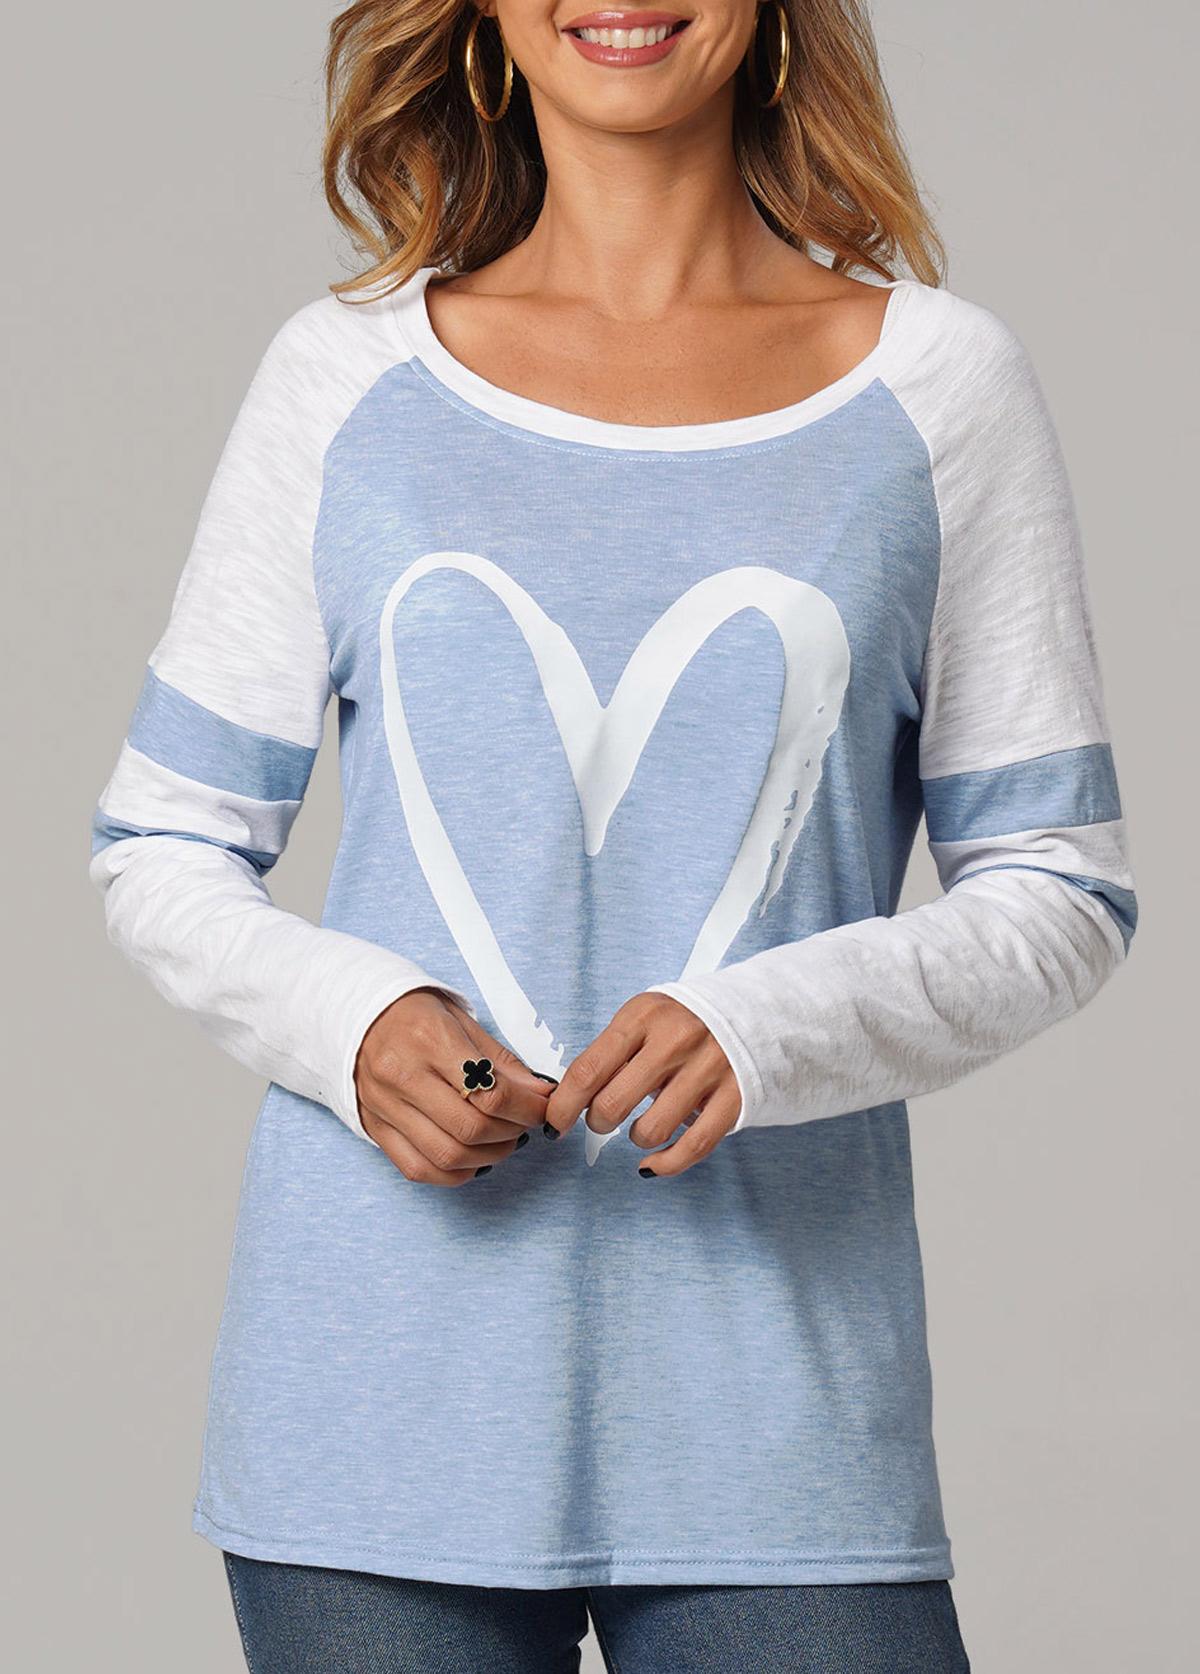 ROTITA Heart Print Round Neck Long Sleeve T Shirt